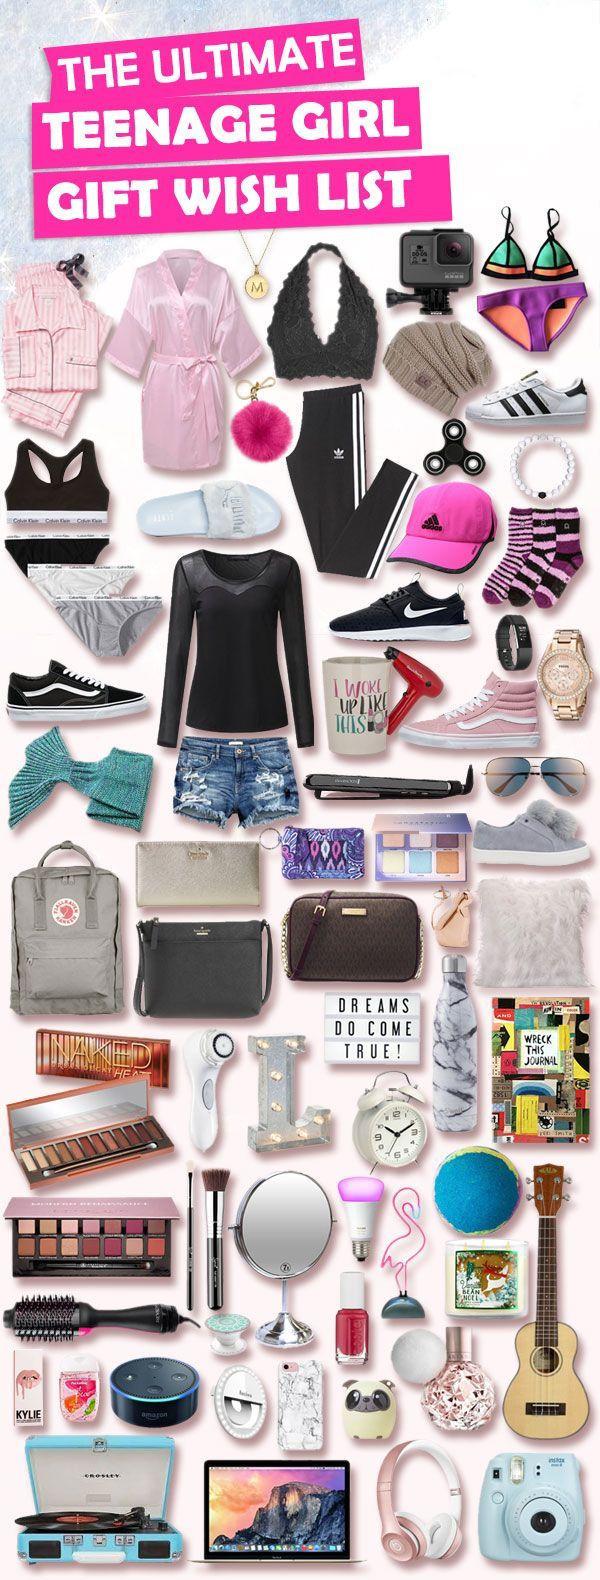 Teenage Girlfriend Gift Ideas  Christmas Gifts for Teenage Girls List